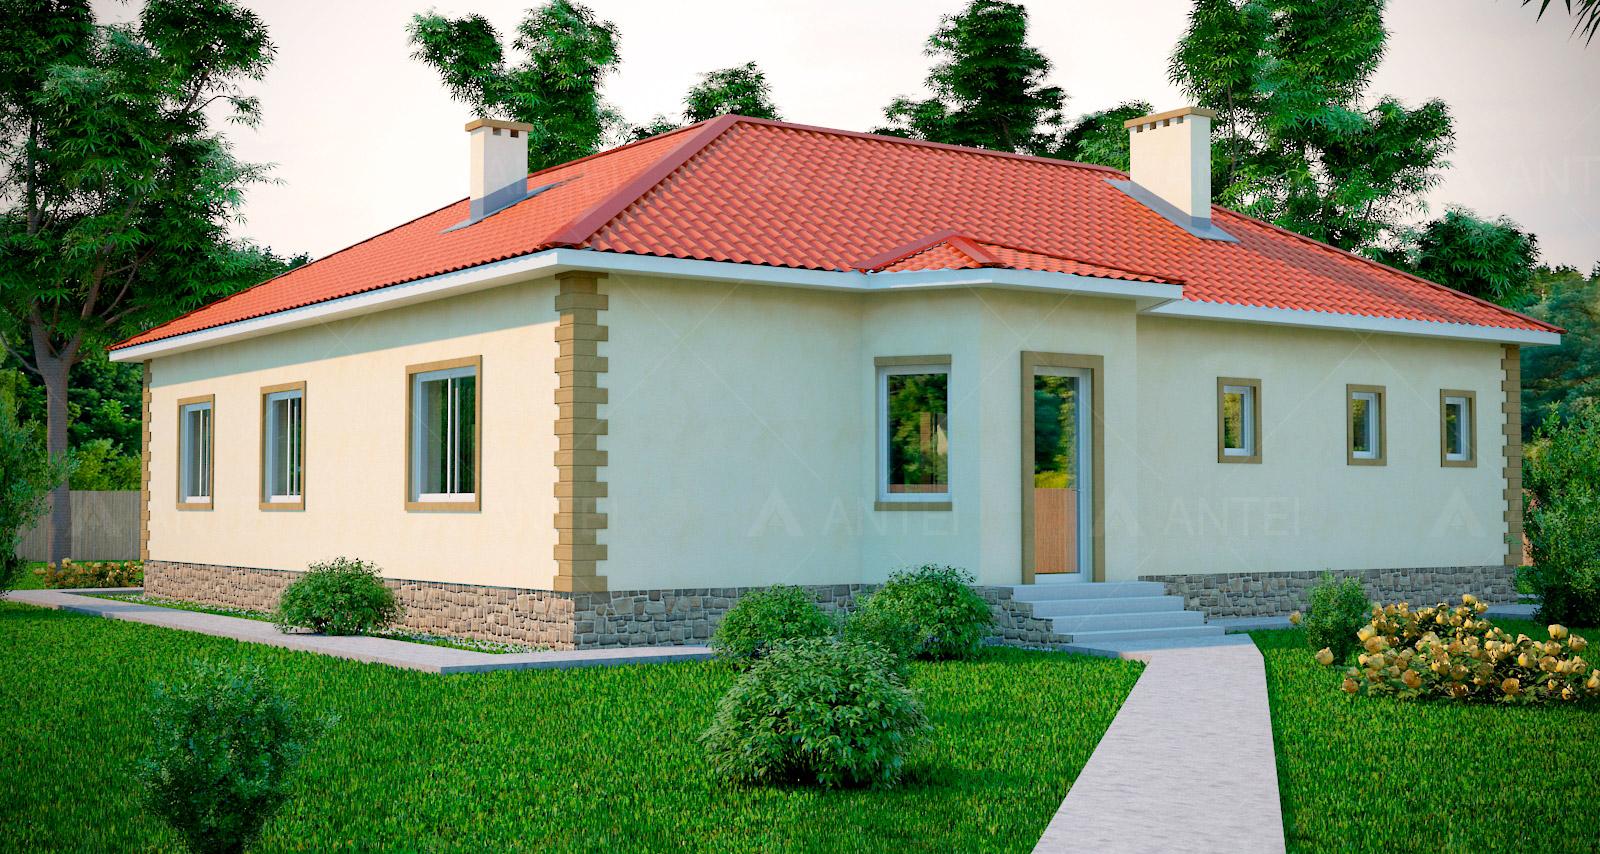 Проект одноэтажного дома с гаражом «КО-47» - фото №1